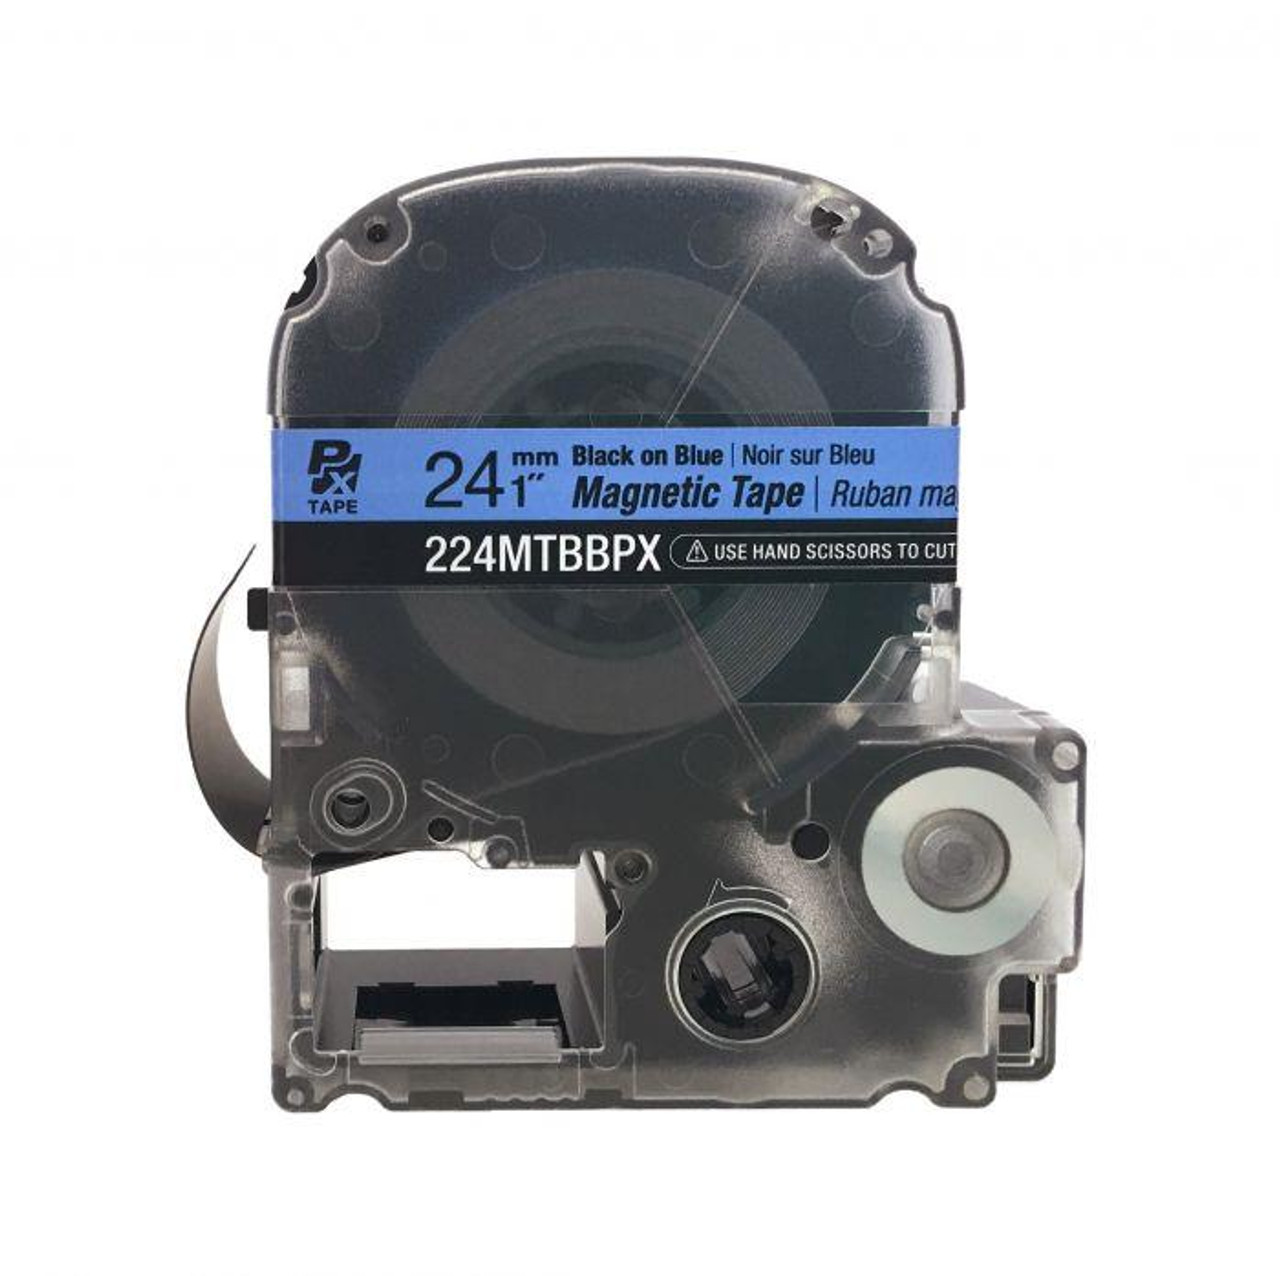 "Epson/K-SUN 224MTBBPX-4.9 BLK ON BLU PX Label Tape 1""/24MM Magnet Tape"